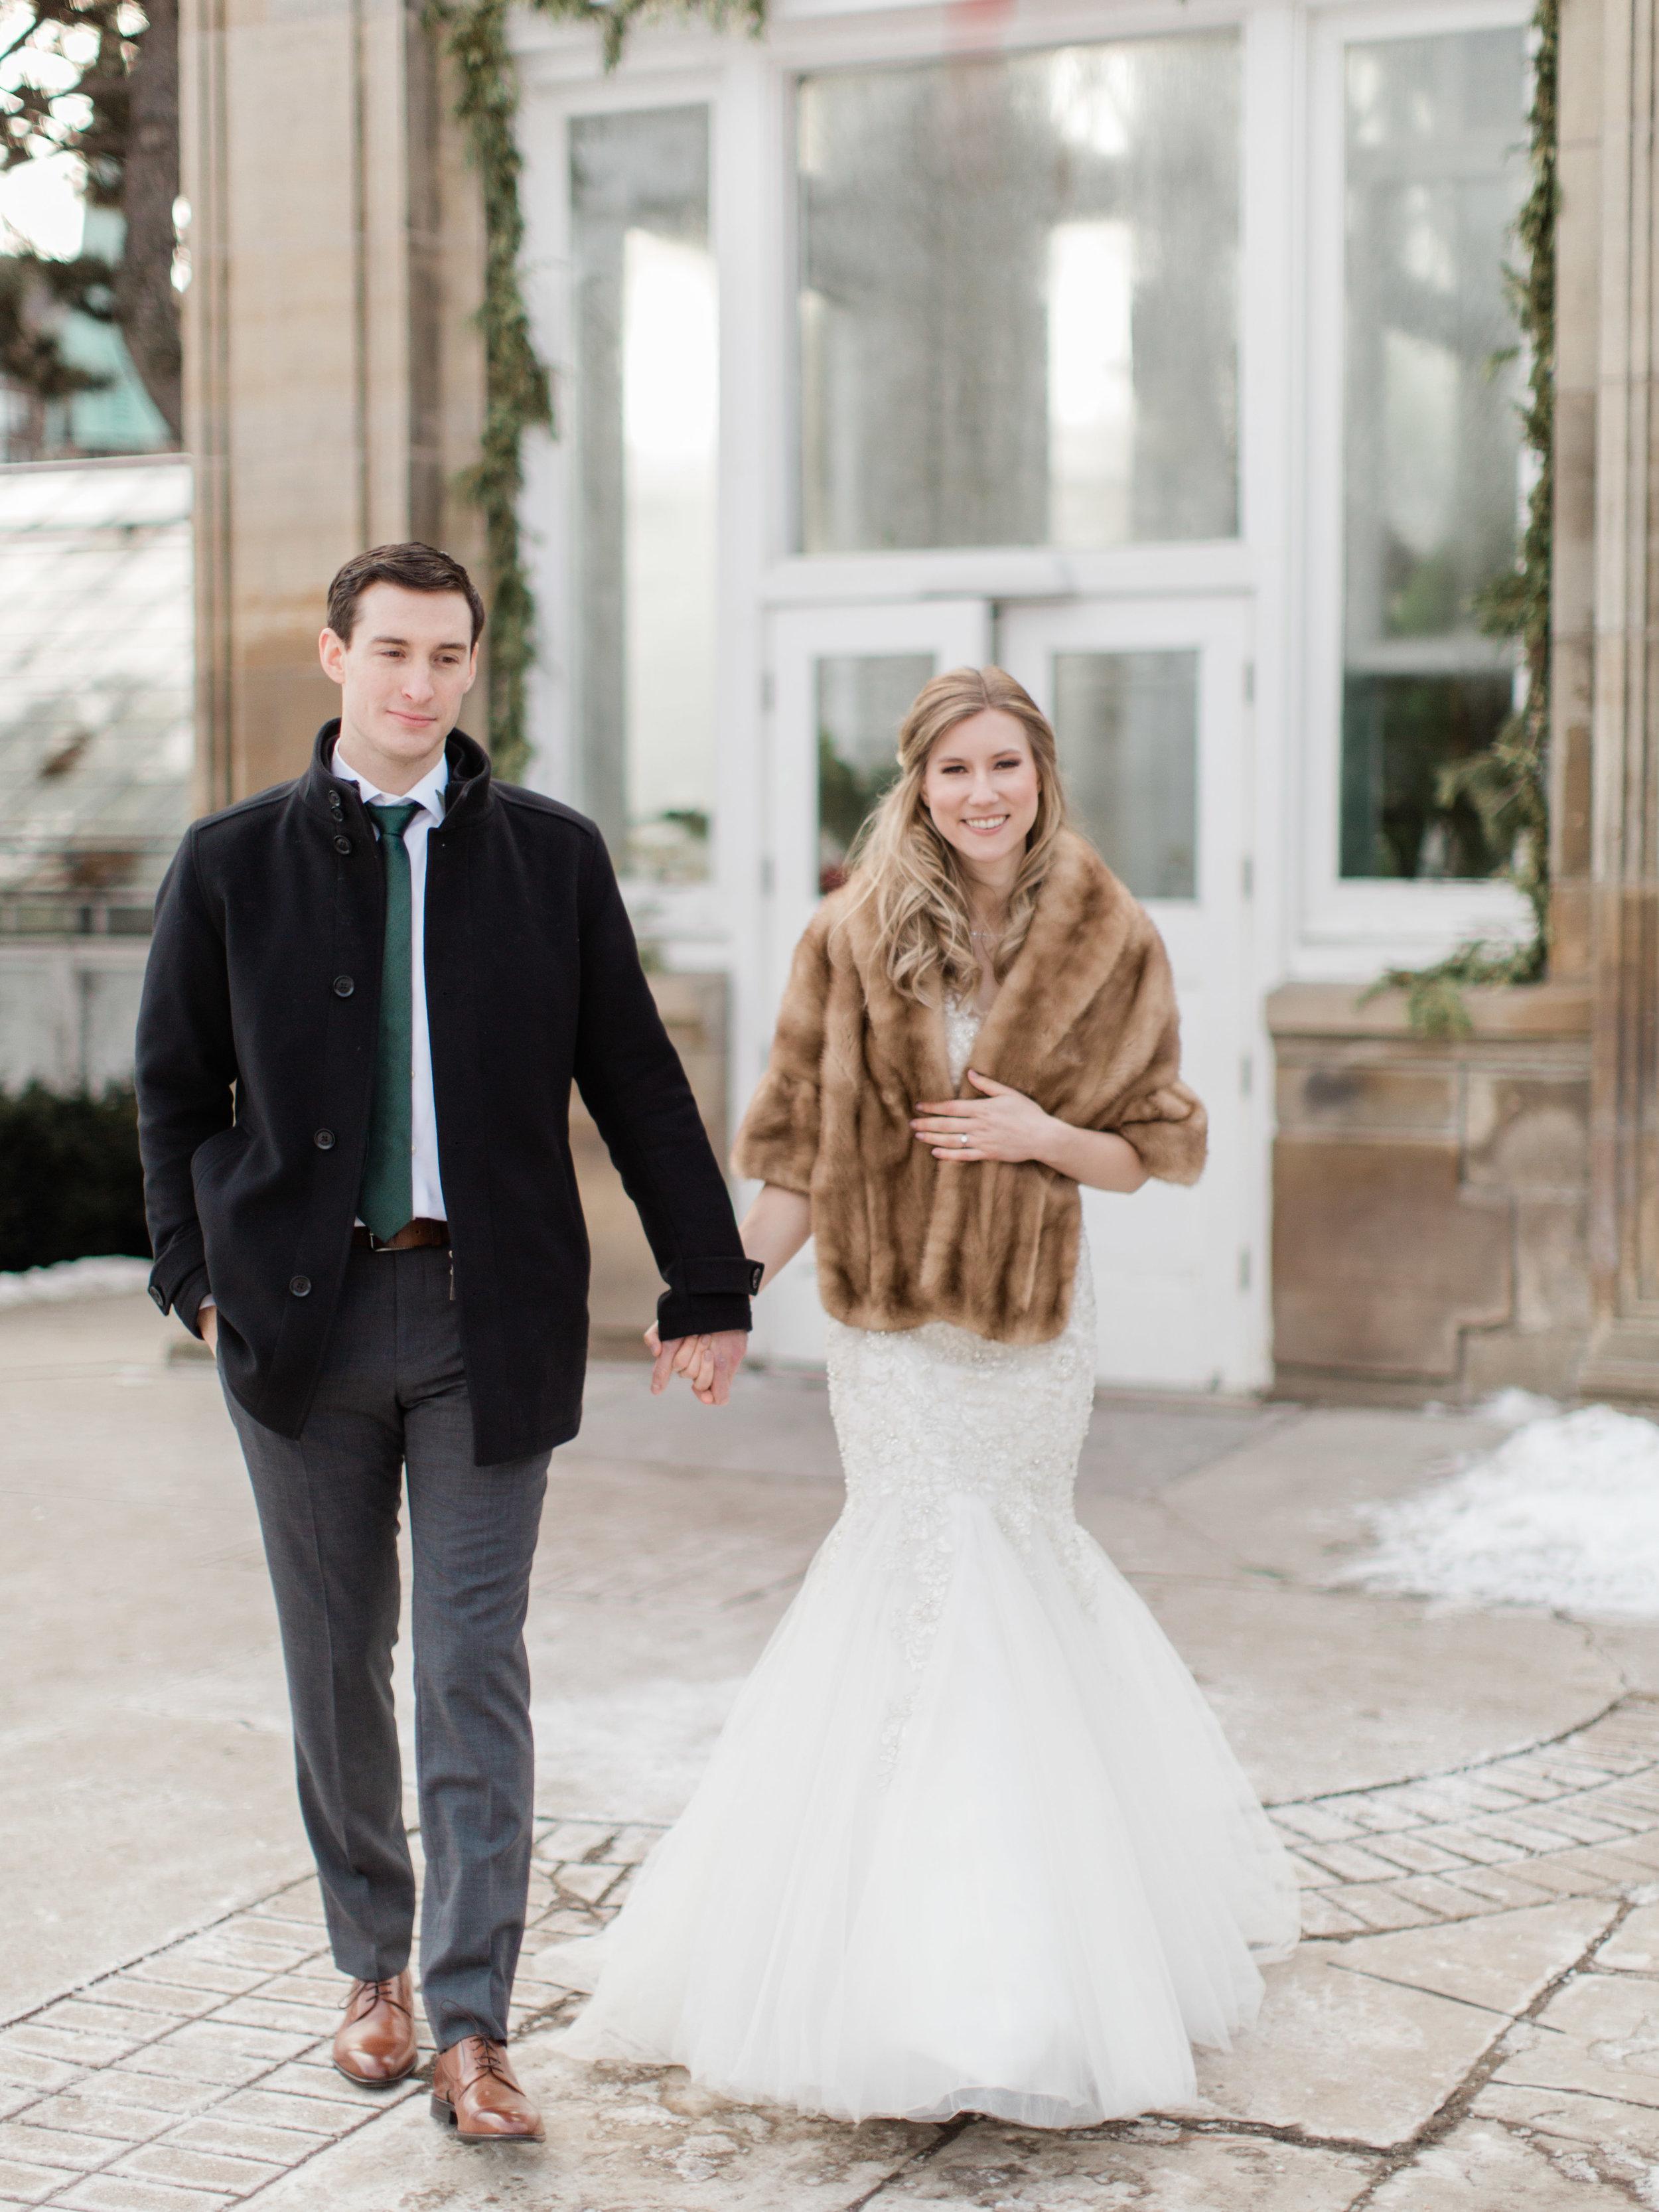 Toronto-wedding-photographer-downtown-winter-wedding-intimate-restaurant-canoe95.jpg